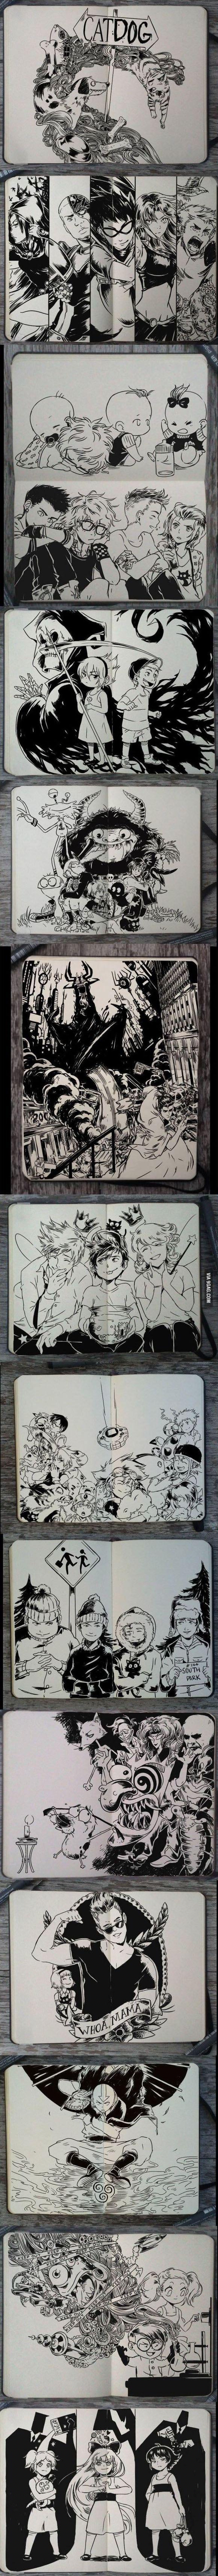 Manga style cartoons.